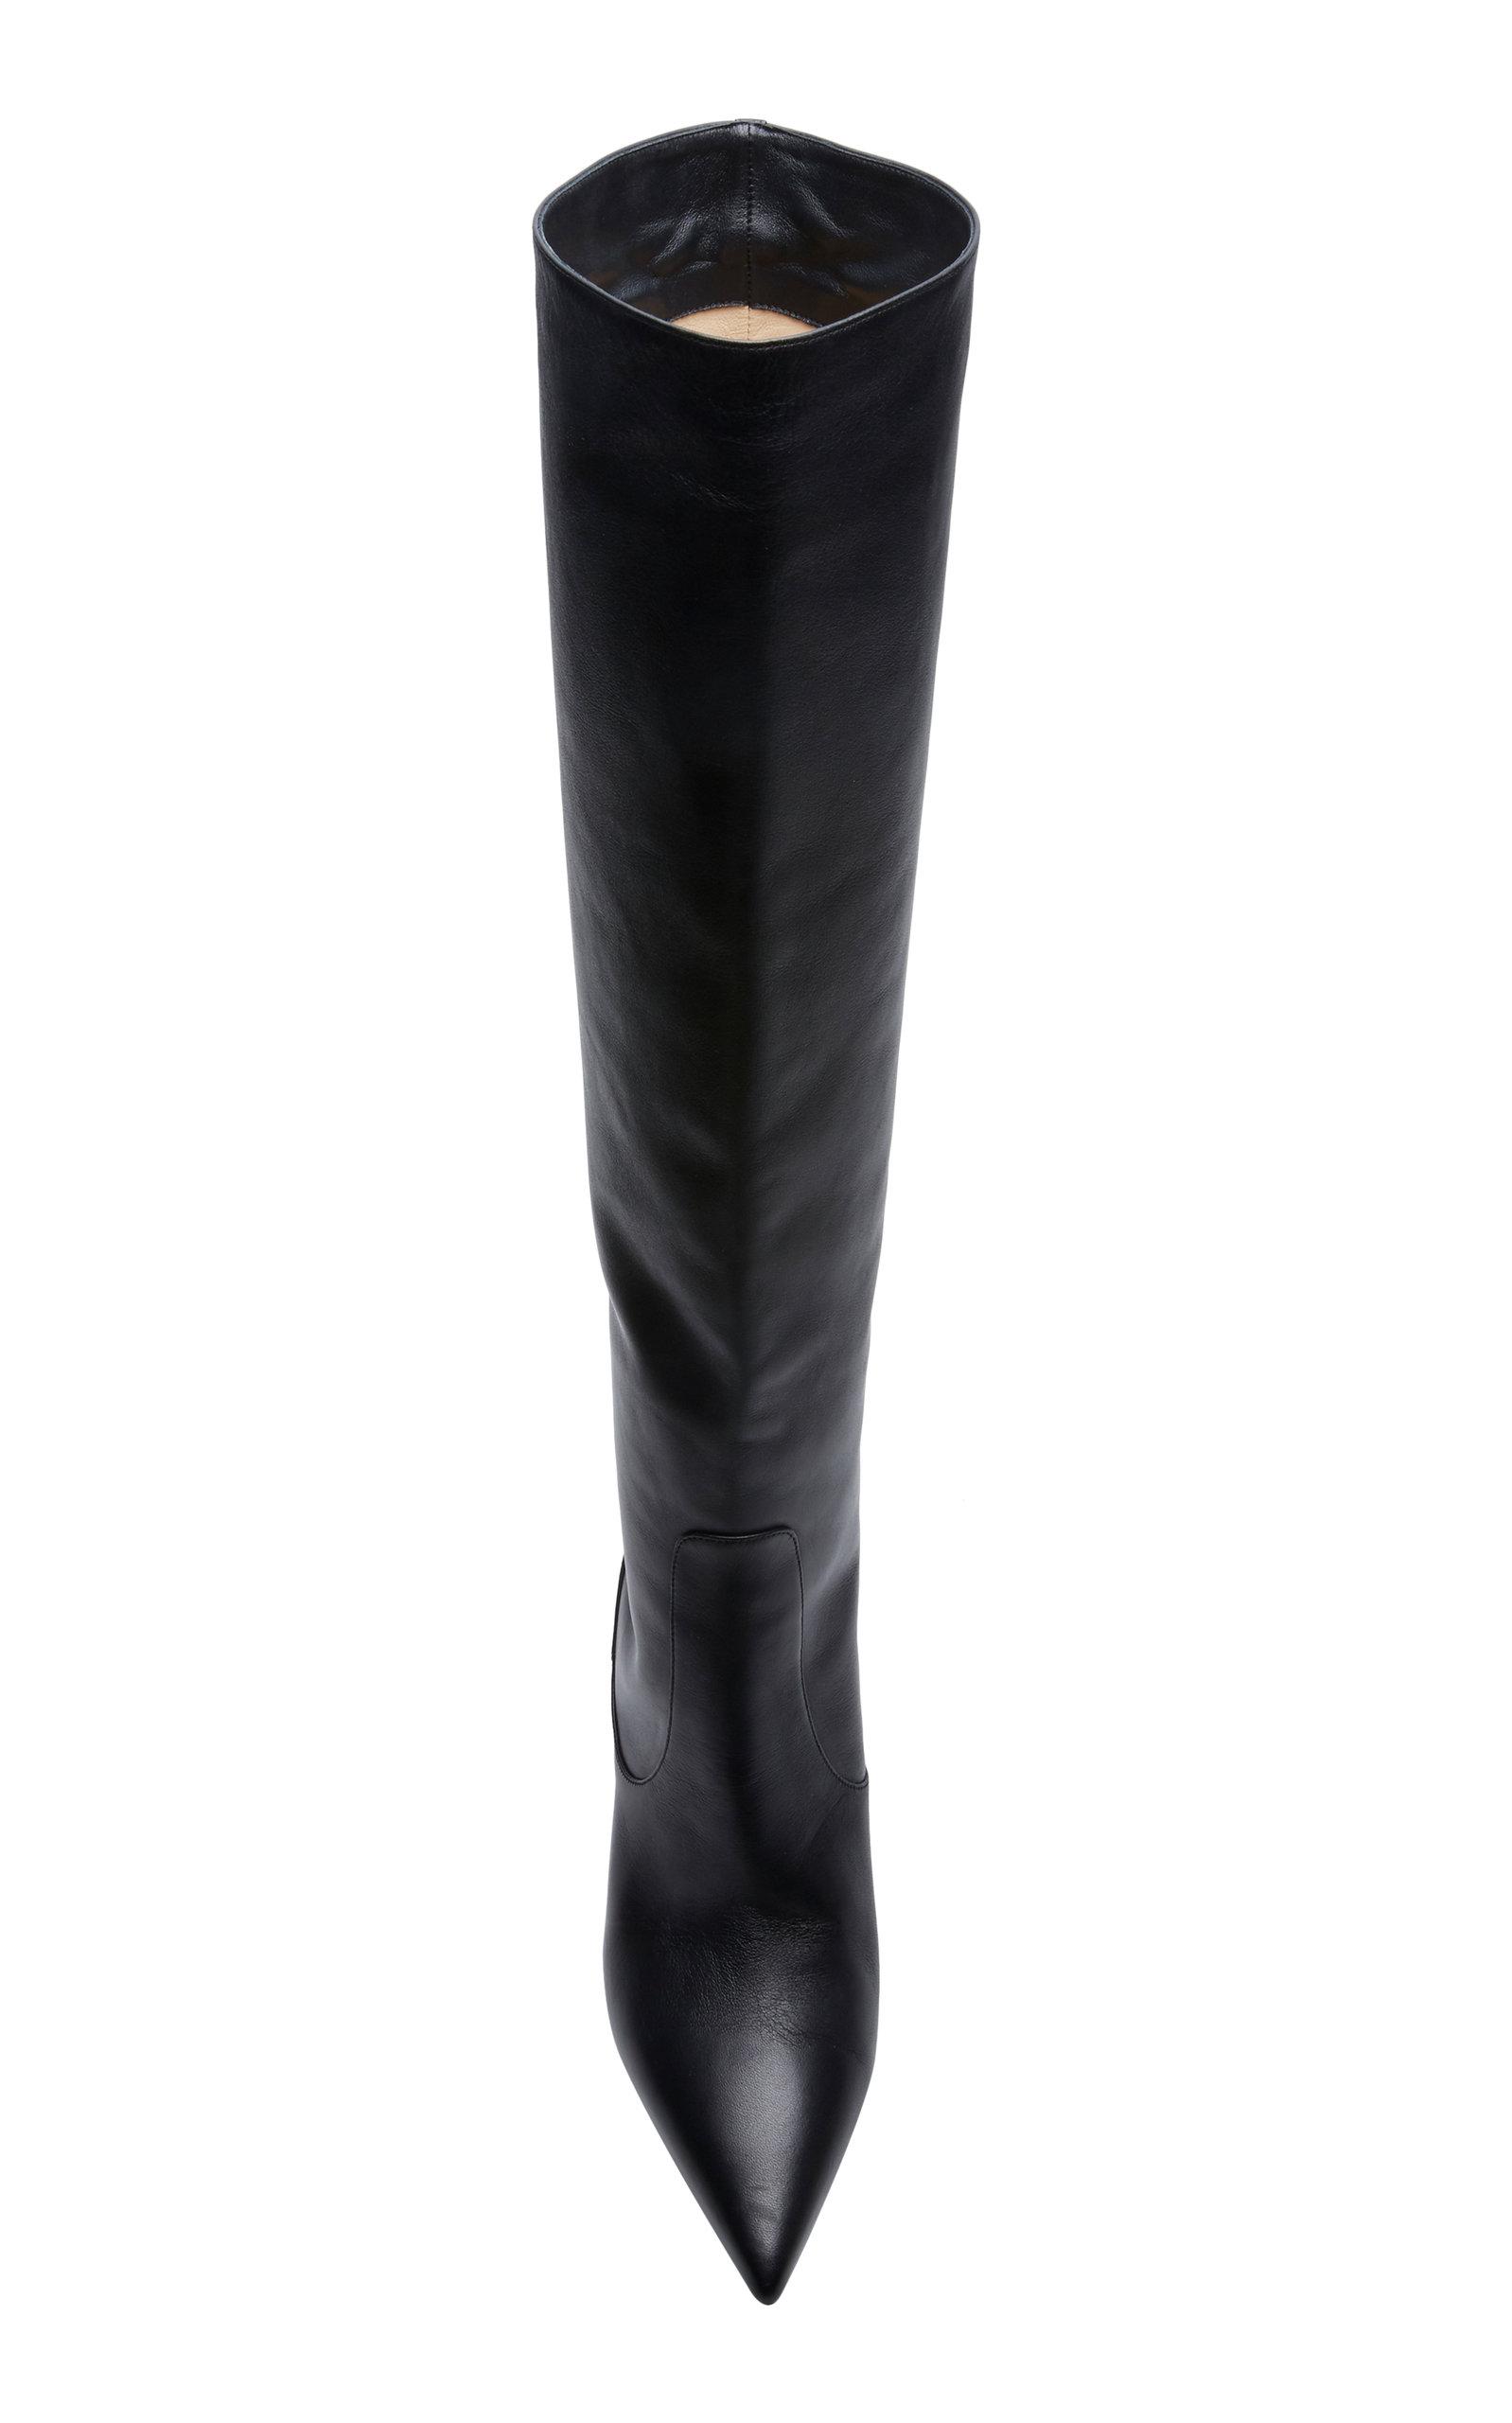 92ec0fc8cb4 Jimmy ChooMavis Leather Boots. CLOSE. Loading. Loading. Loading